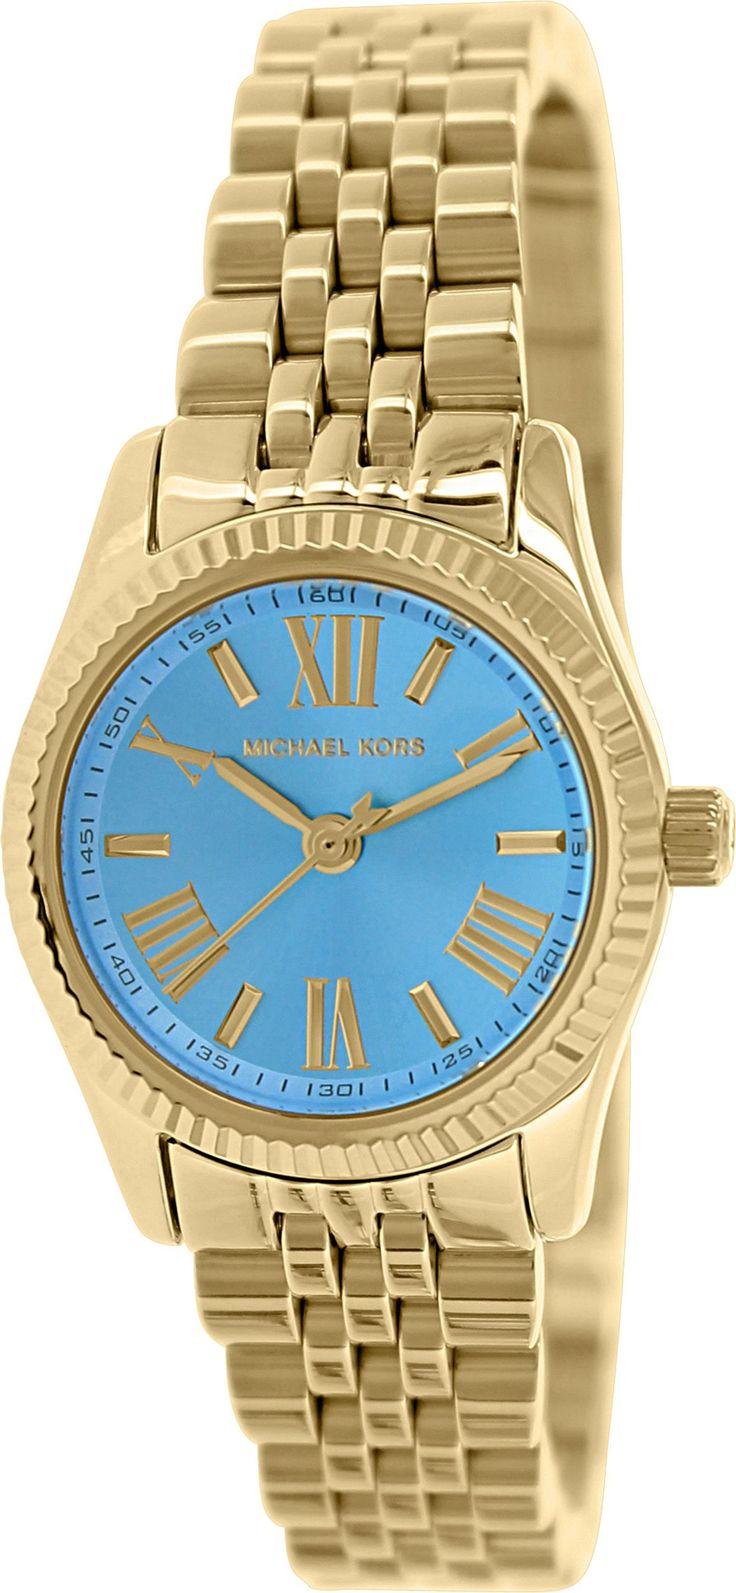 Amazon.com: Michael Kors Lexington Ocean Blue Dial Gold-tone Ladies Watch MK3271: Michael Kors: Watches